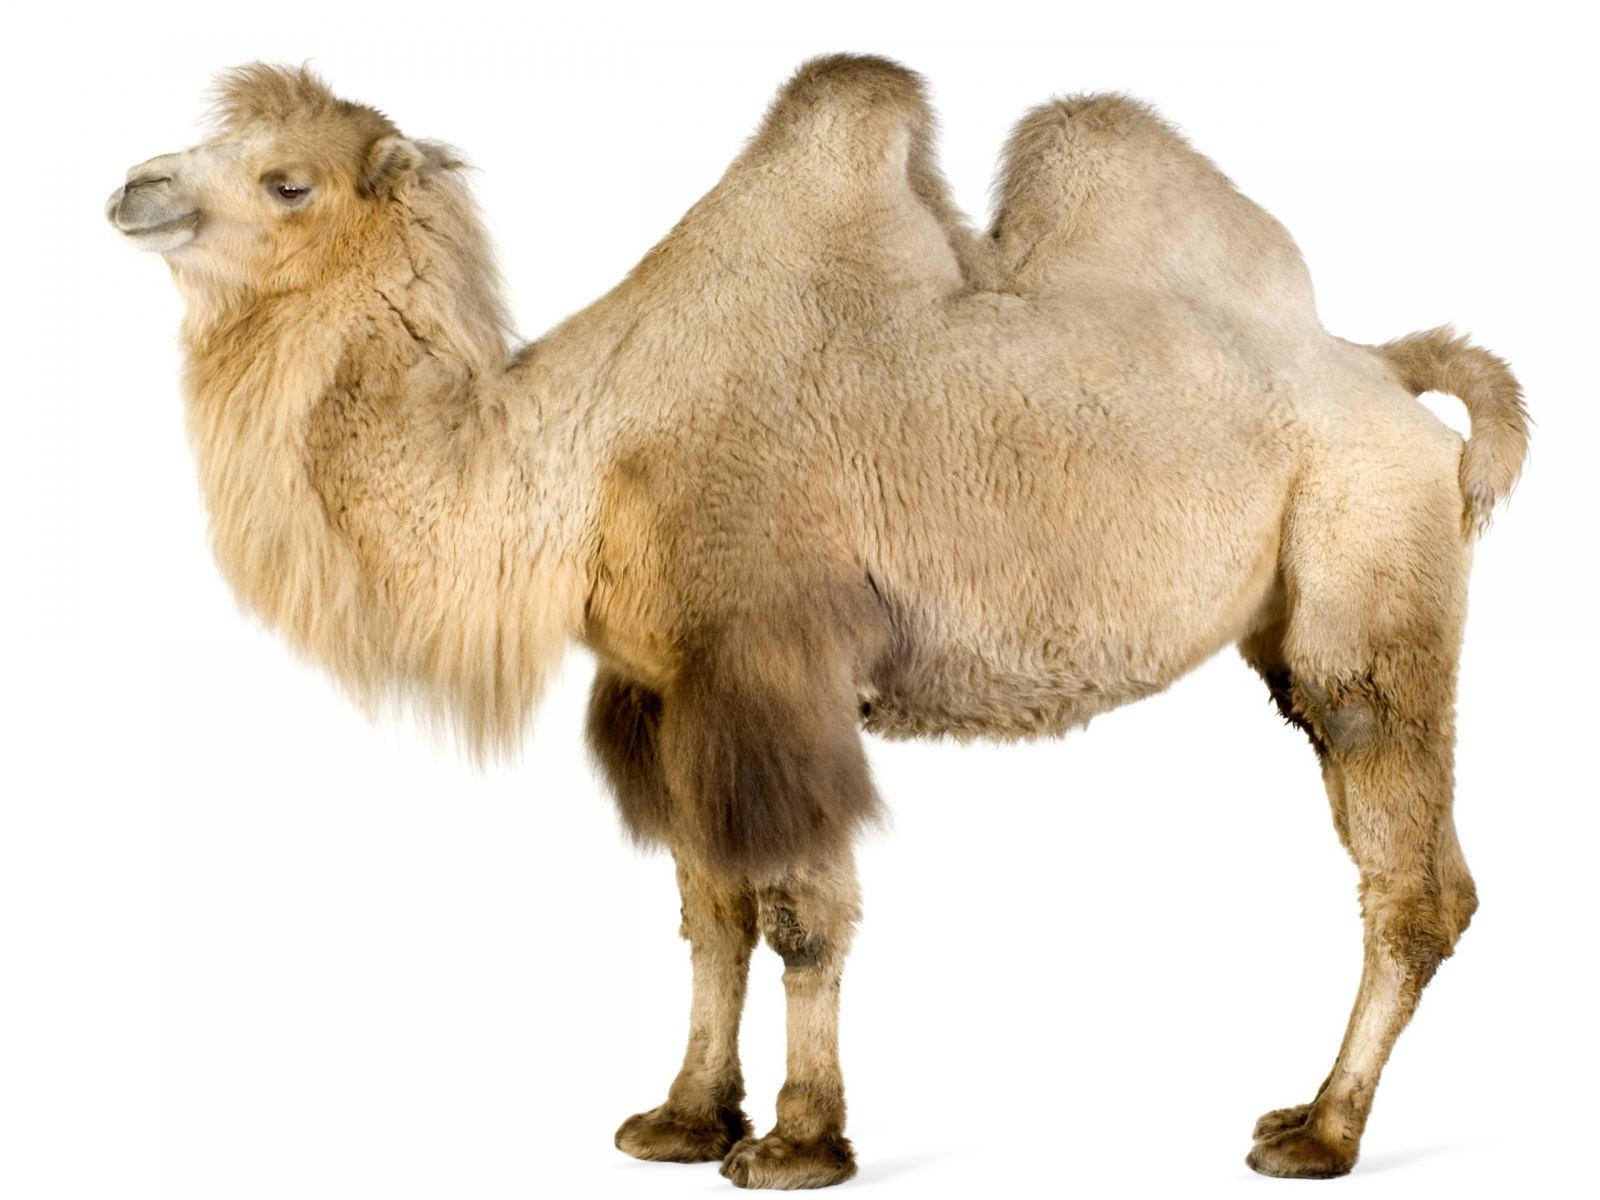 ... Bactrian Camel Bactrian Camel